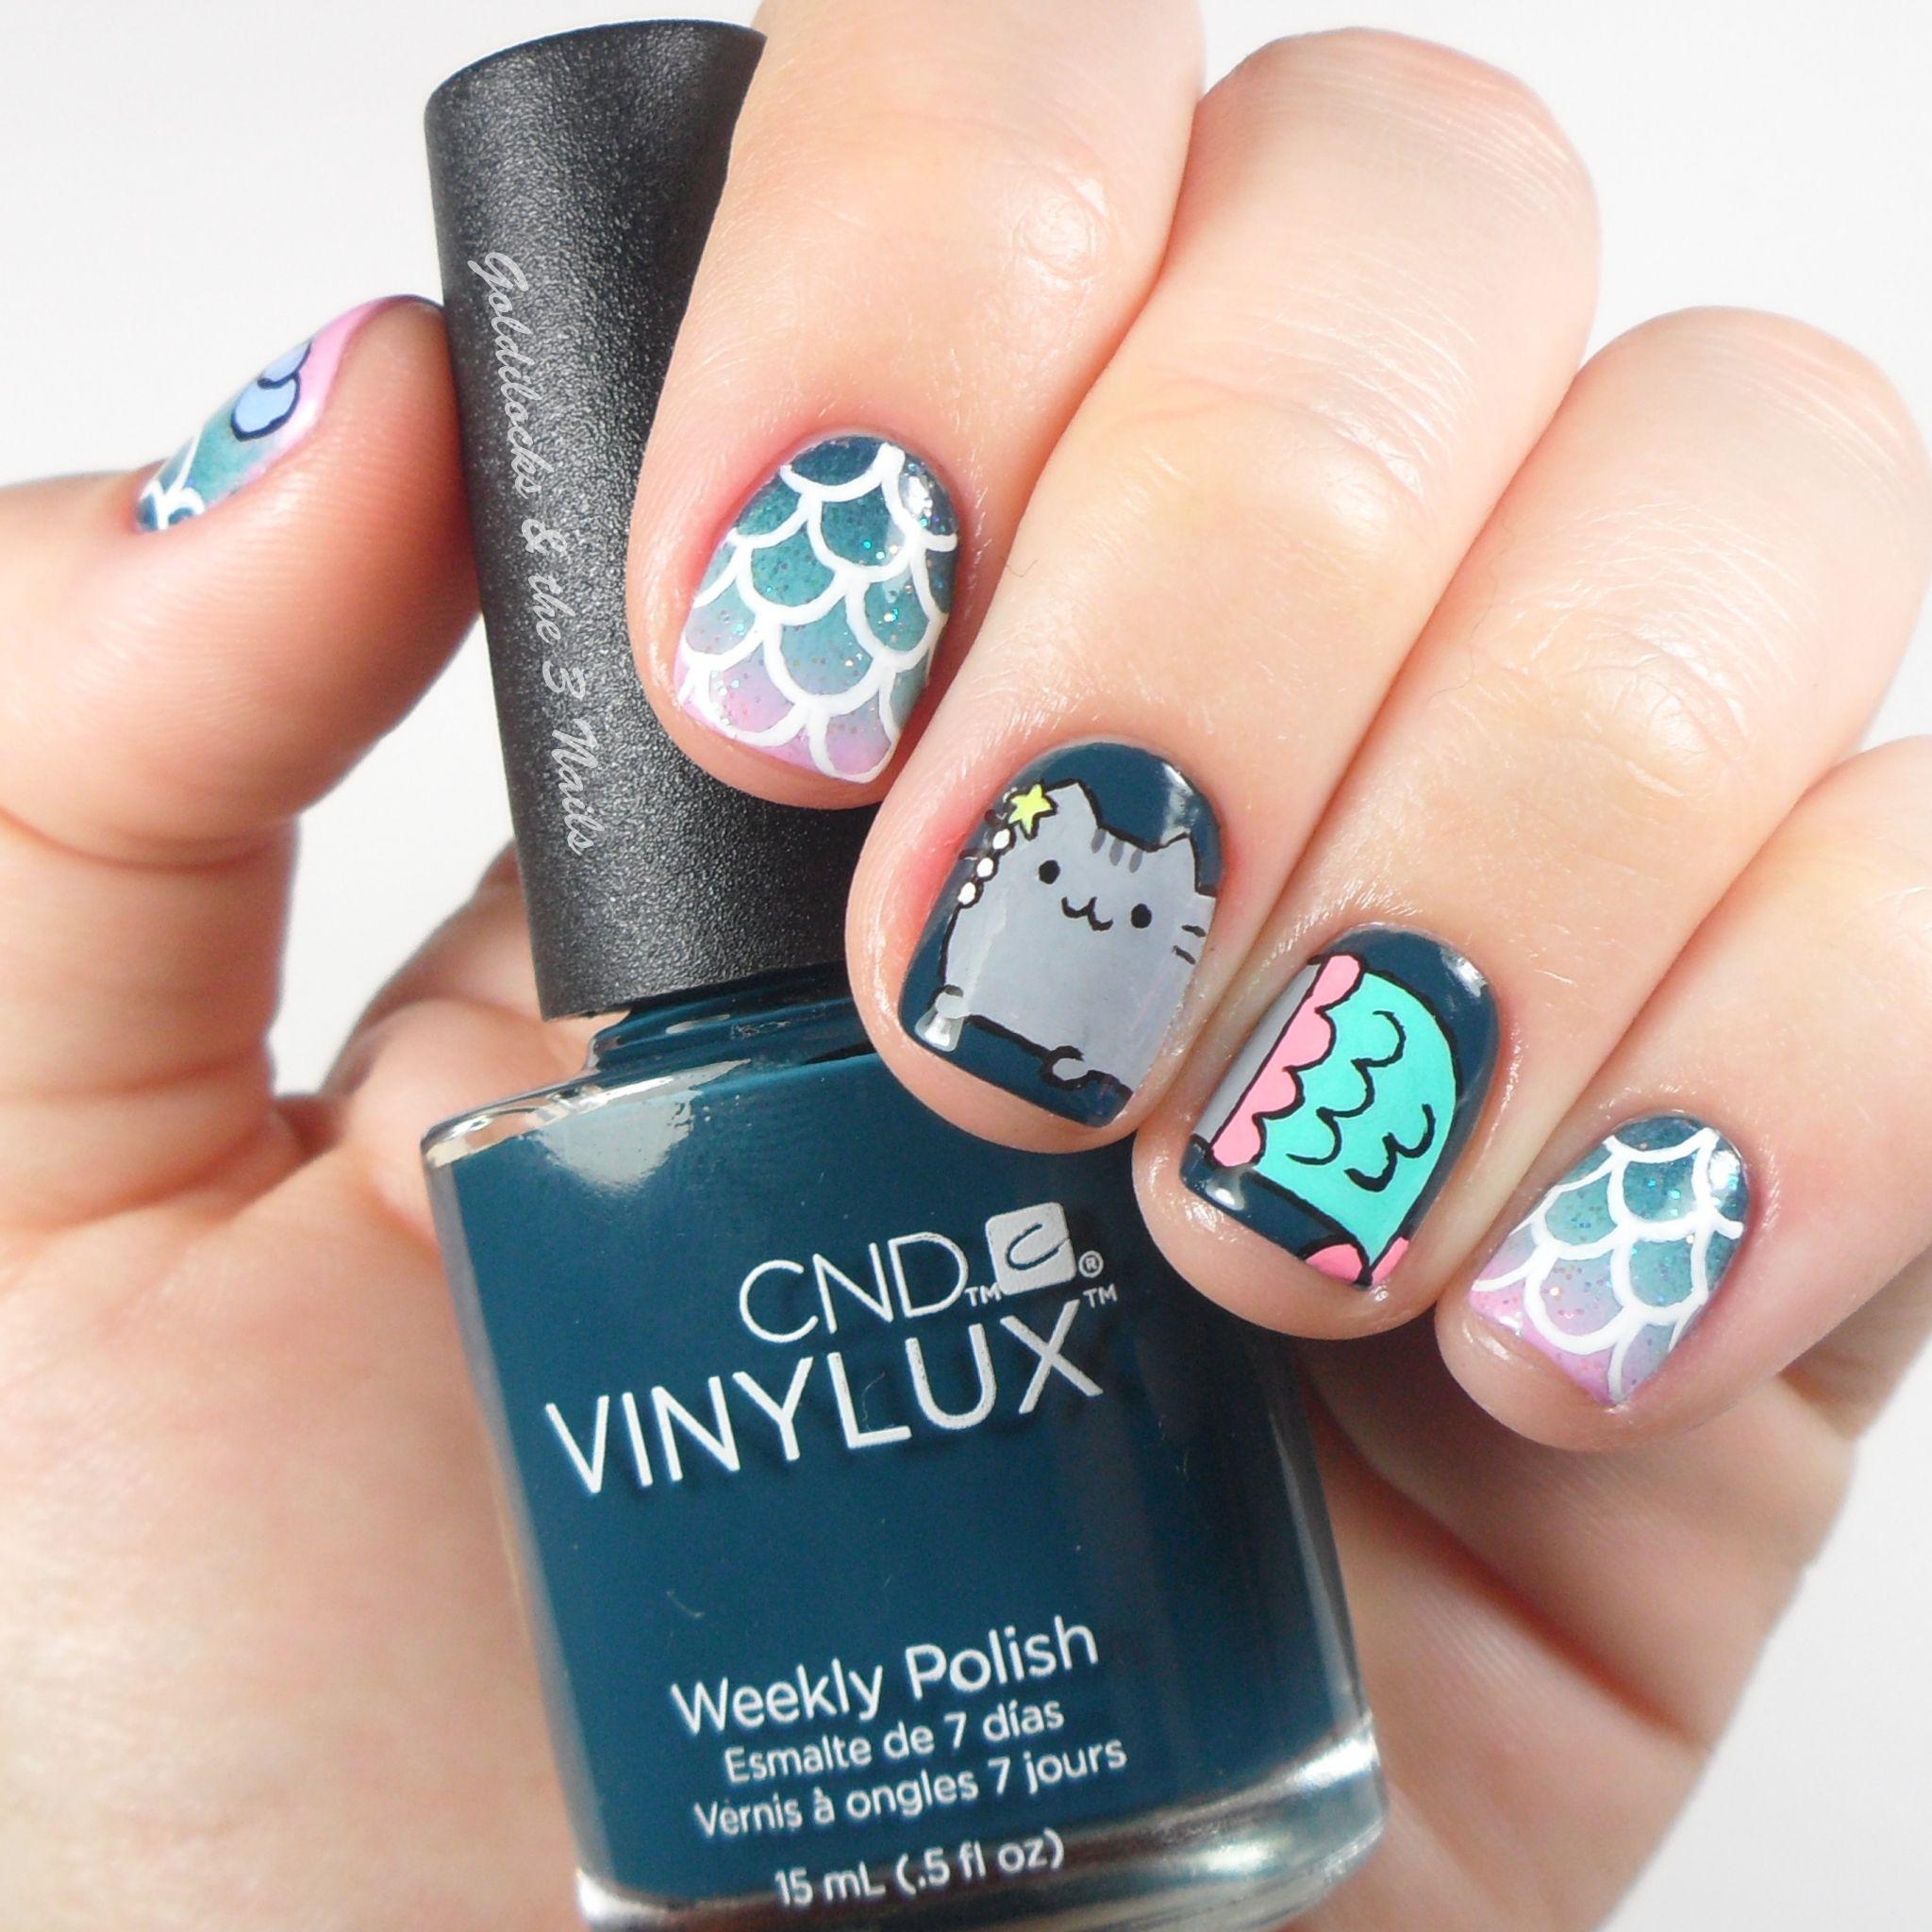 Pusheen Cat Mermaid Nail Art Cat Nails Cnd Vinylux